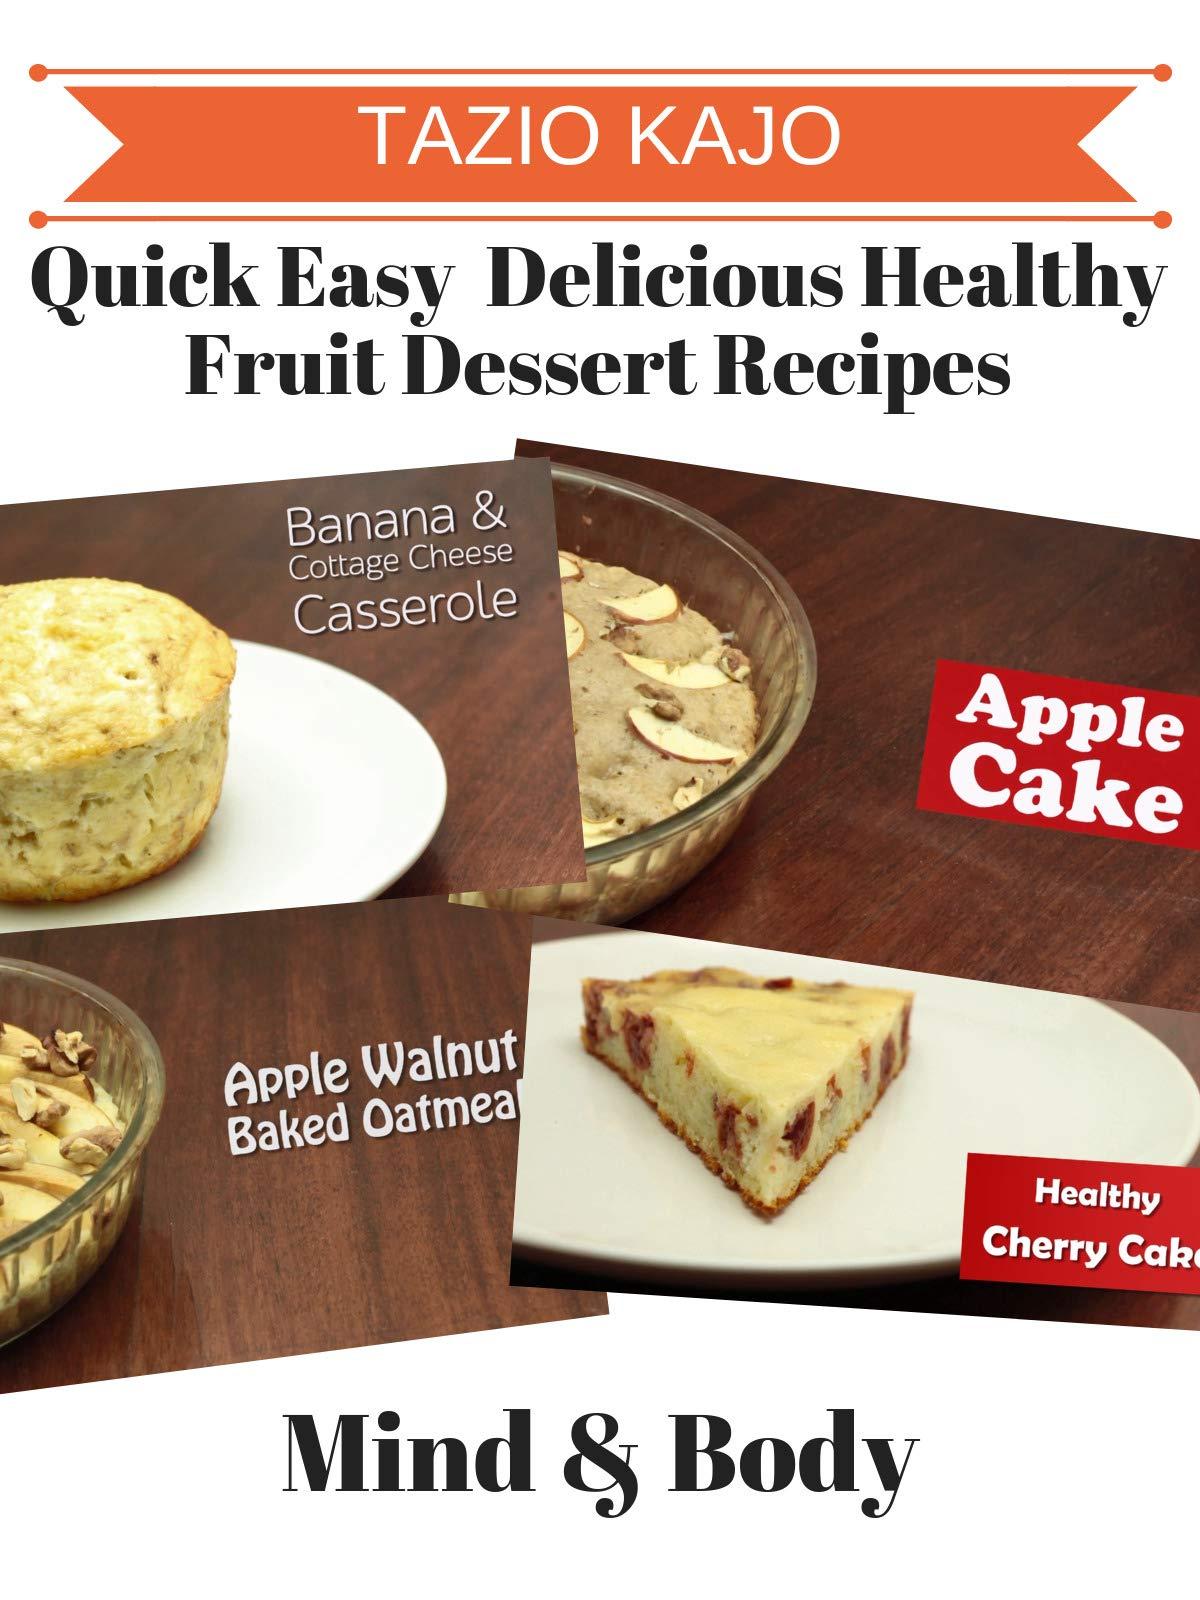 Quick Easy & Delicious Healthy Fruit Dessert Recipes